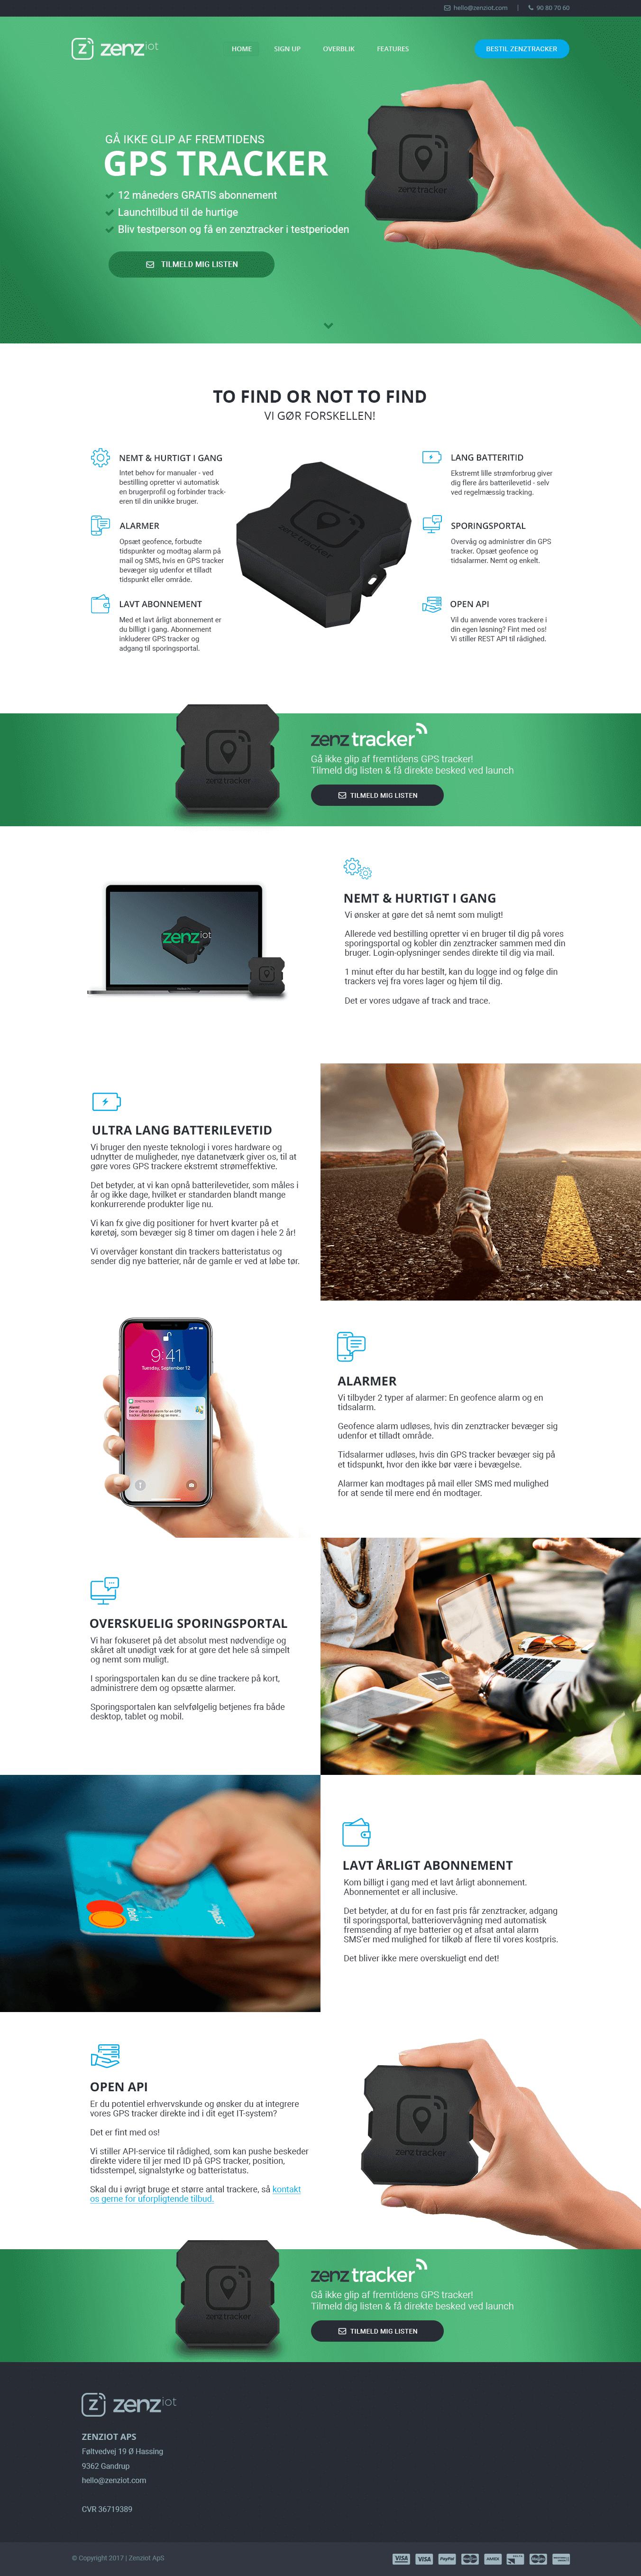 Webdesign landingpage